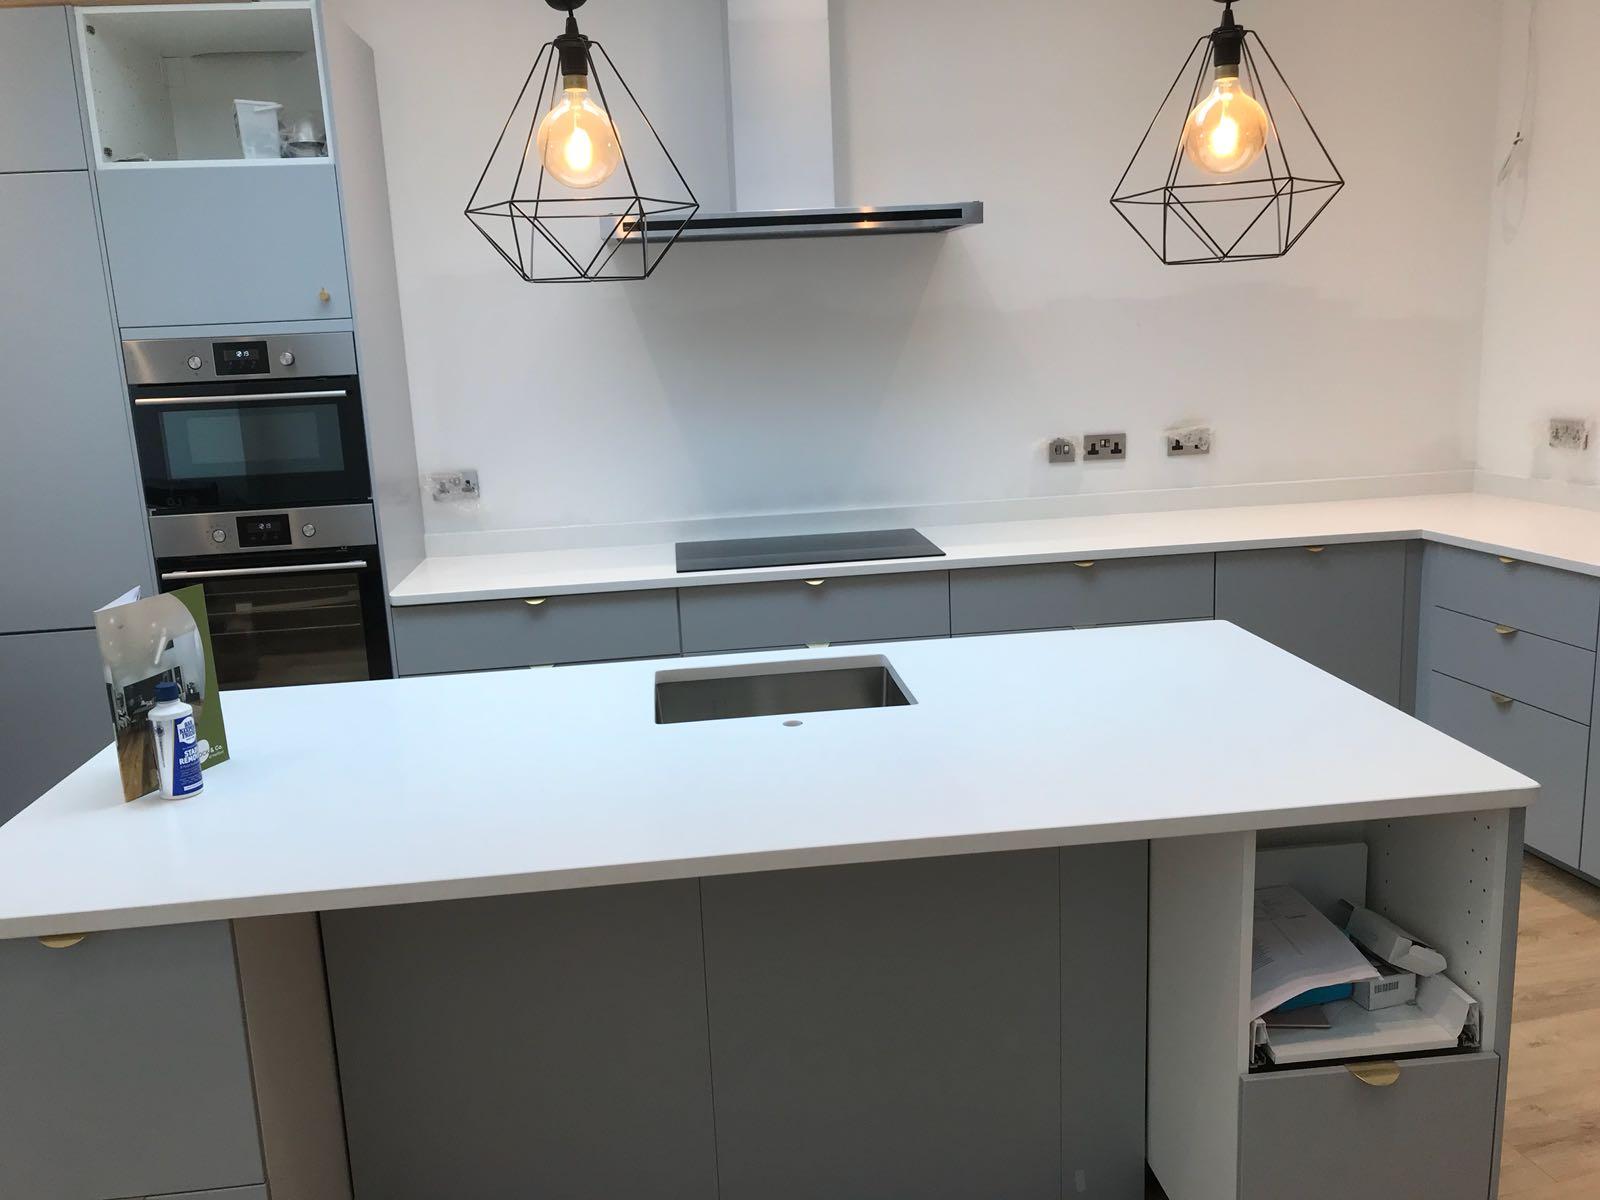 Kitchen of the week… Located in Saffron Walden, Essex, showcasing the Bianco Marmo Suprema